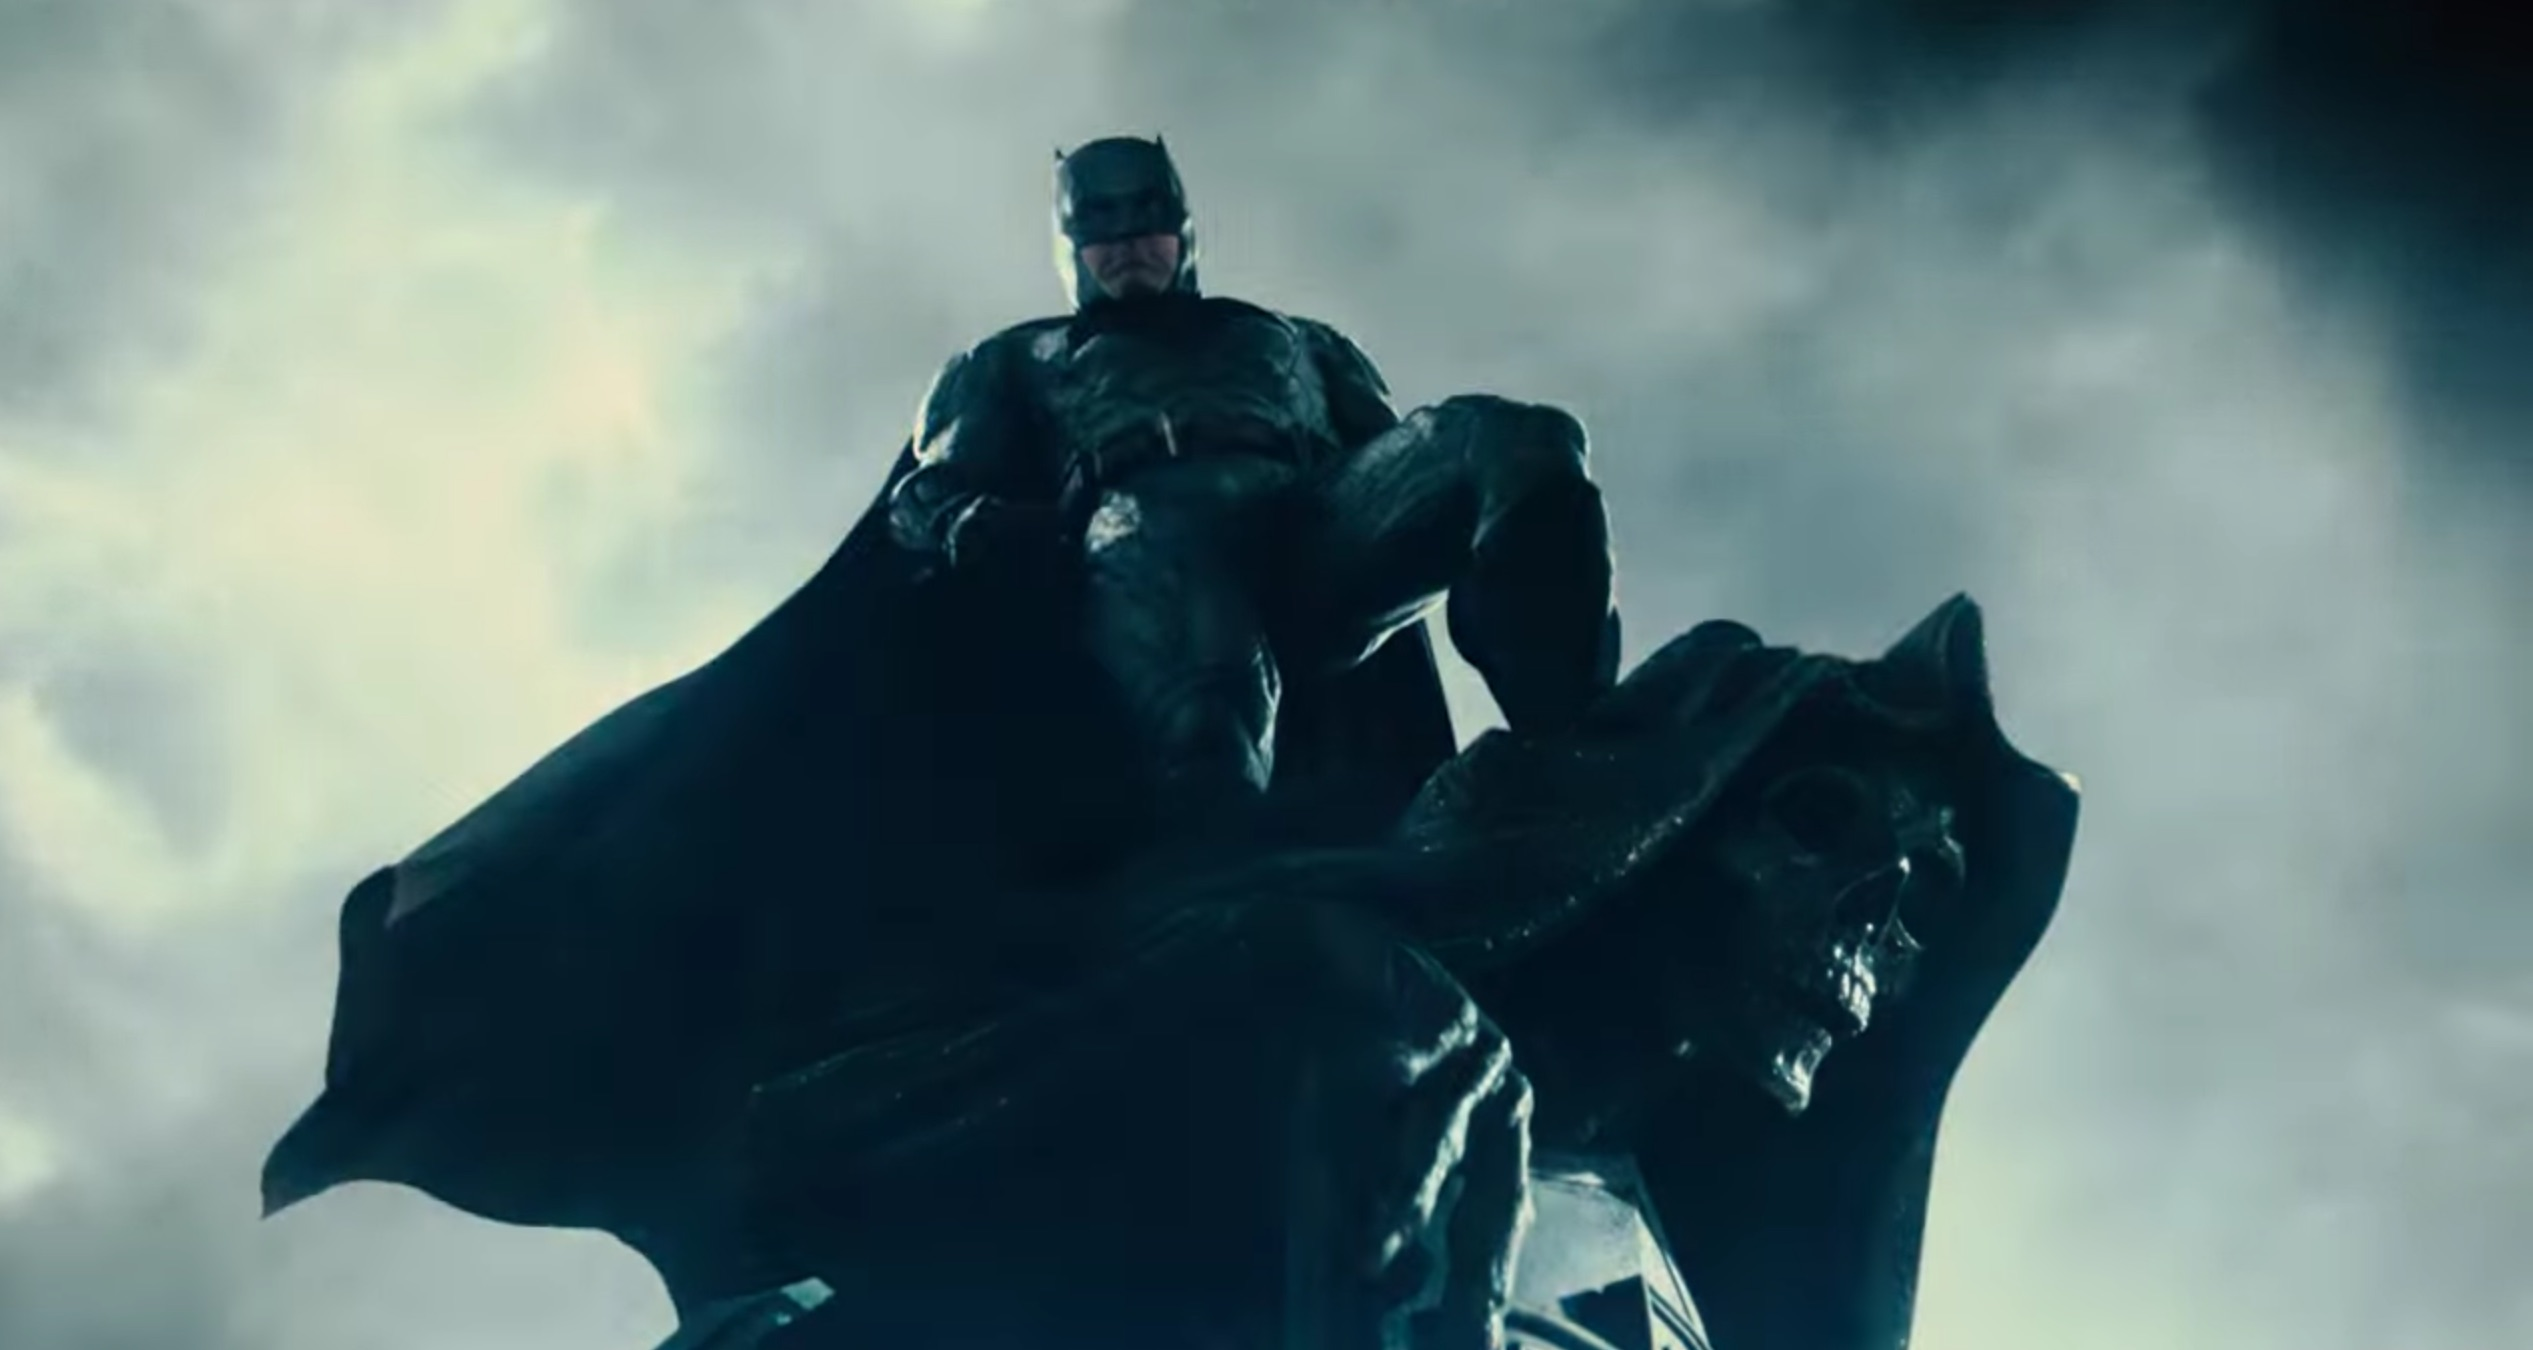 Ben Affleck Justice League movie Batman